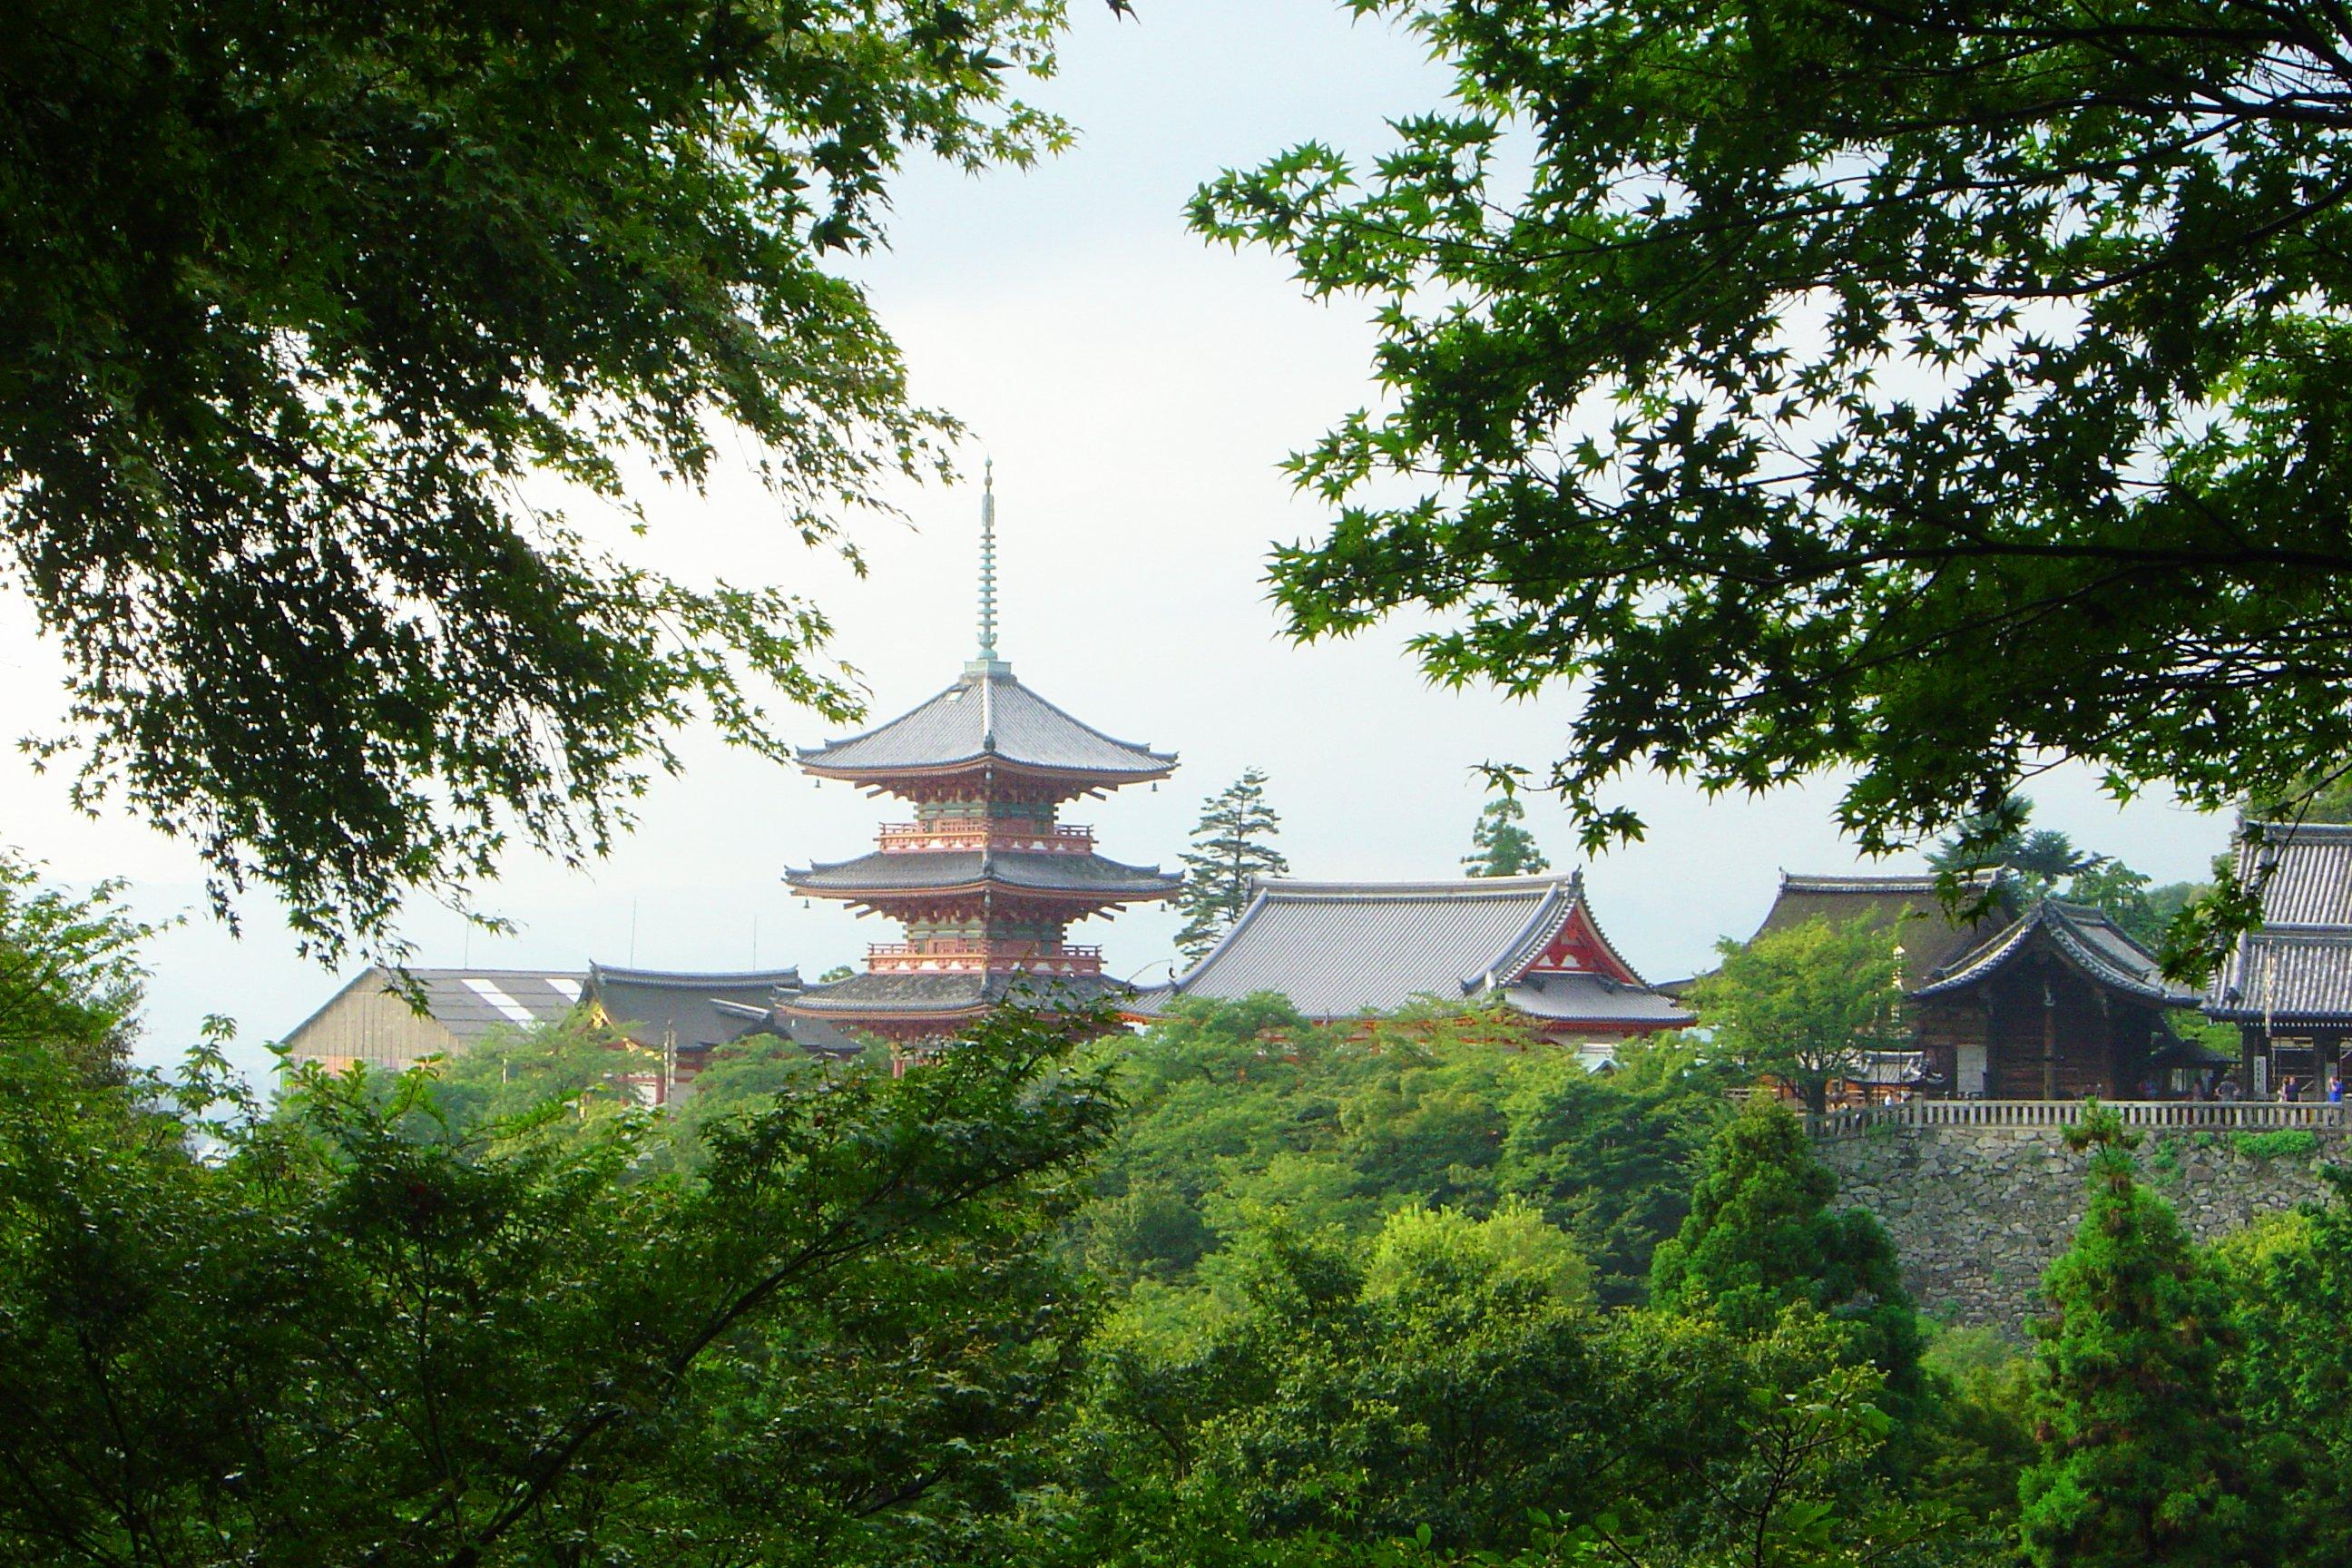 Kyoto & Nara, photo by David Monniaux